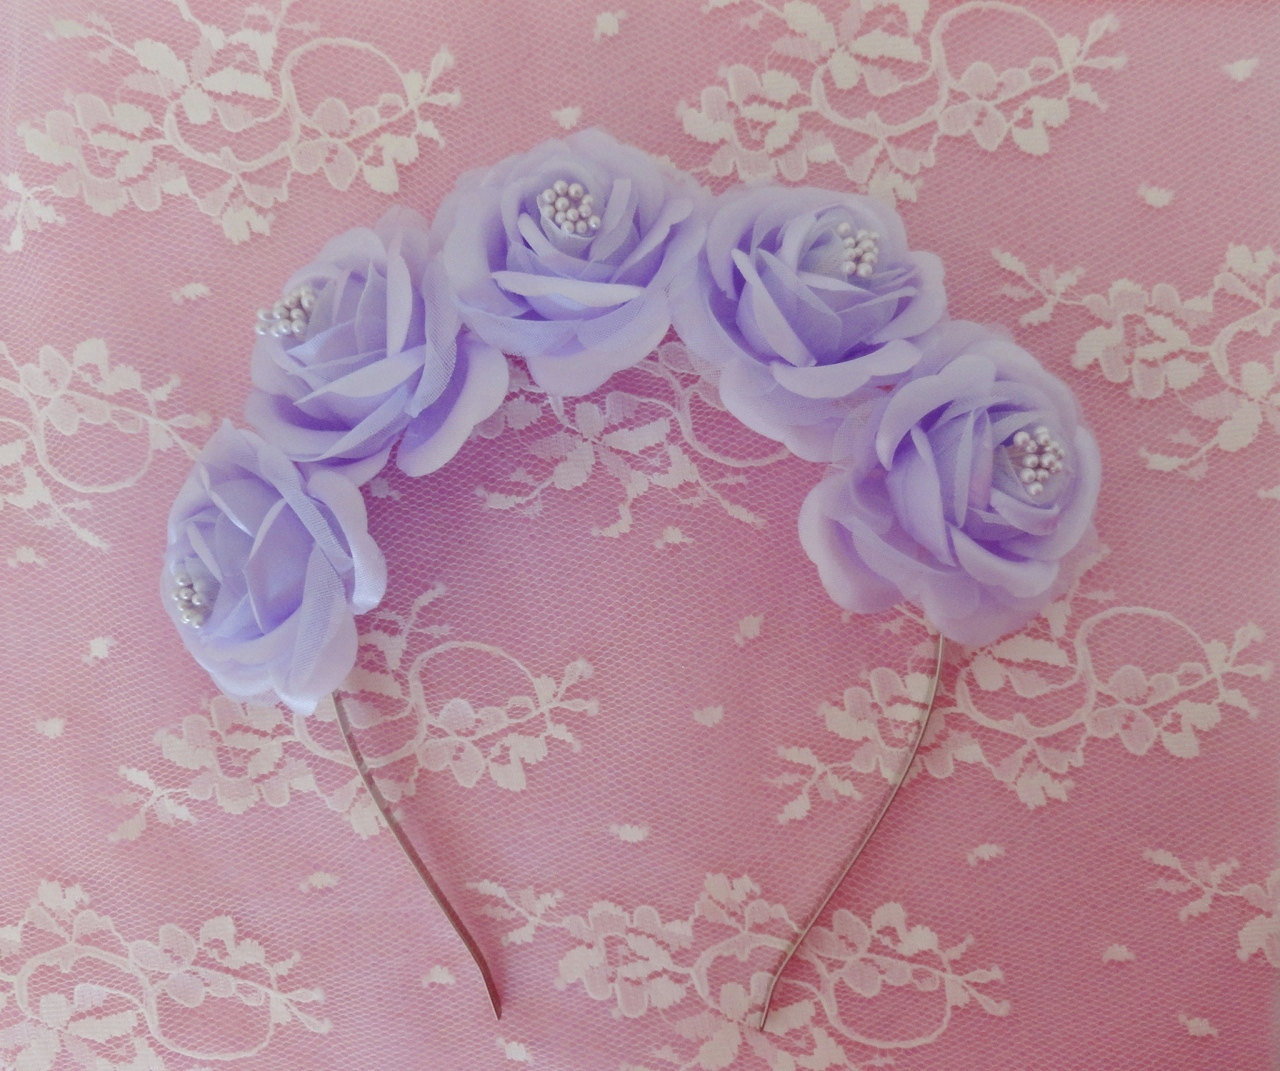 Lily flower crown pastel goth purple by voxpopulijewelry on zibbet izmirmasajfo